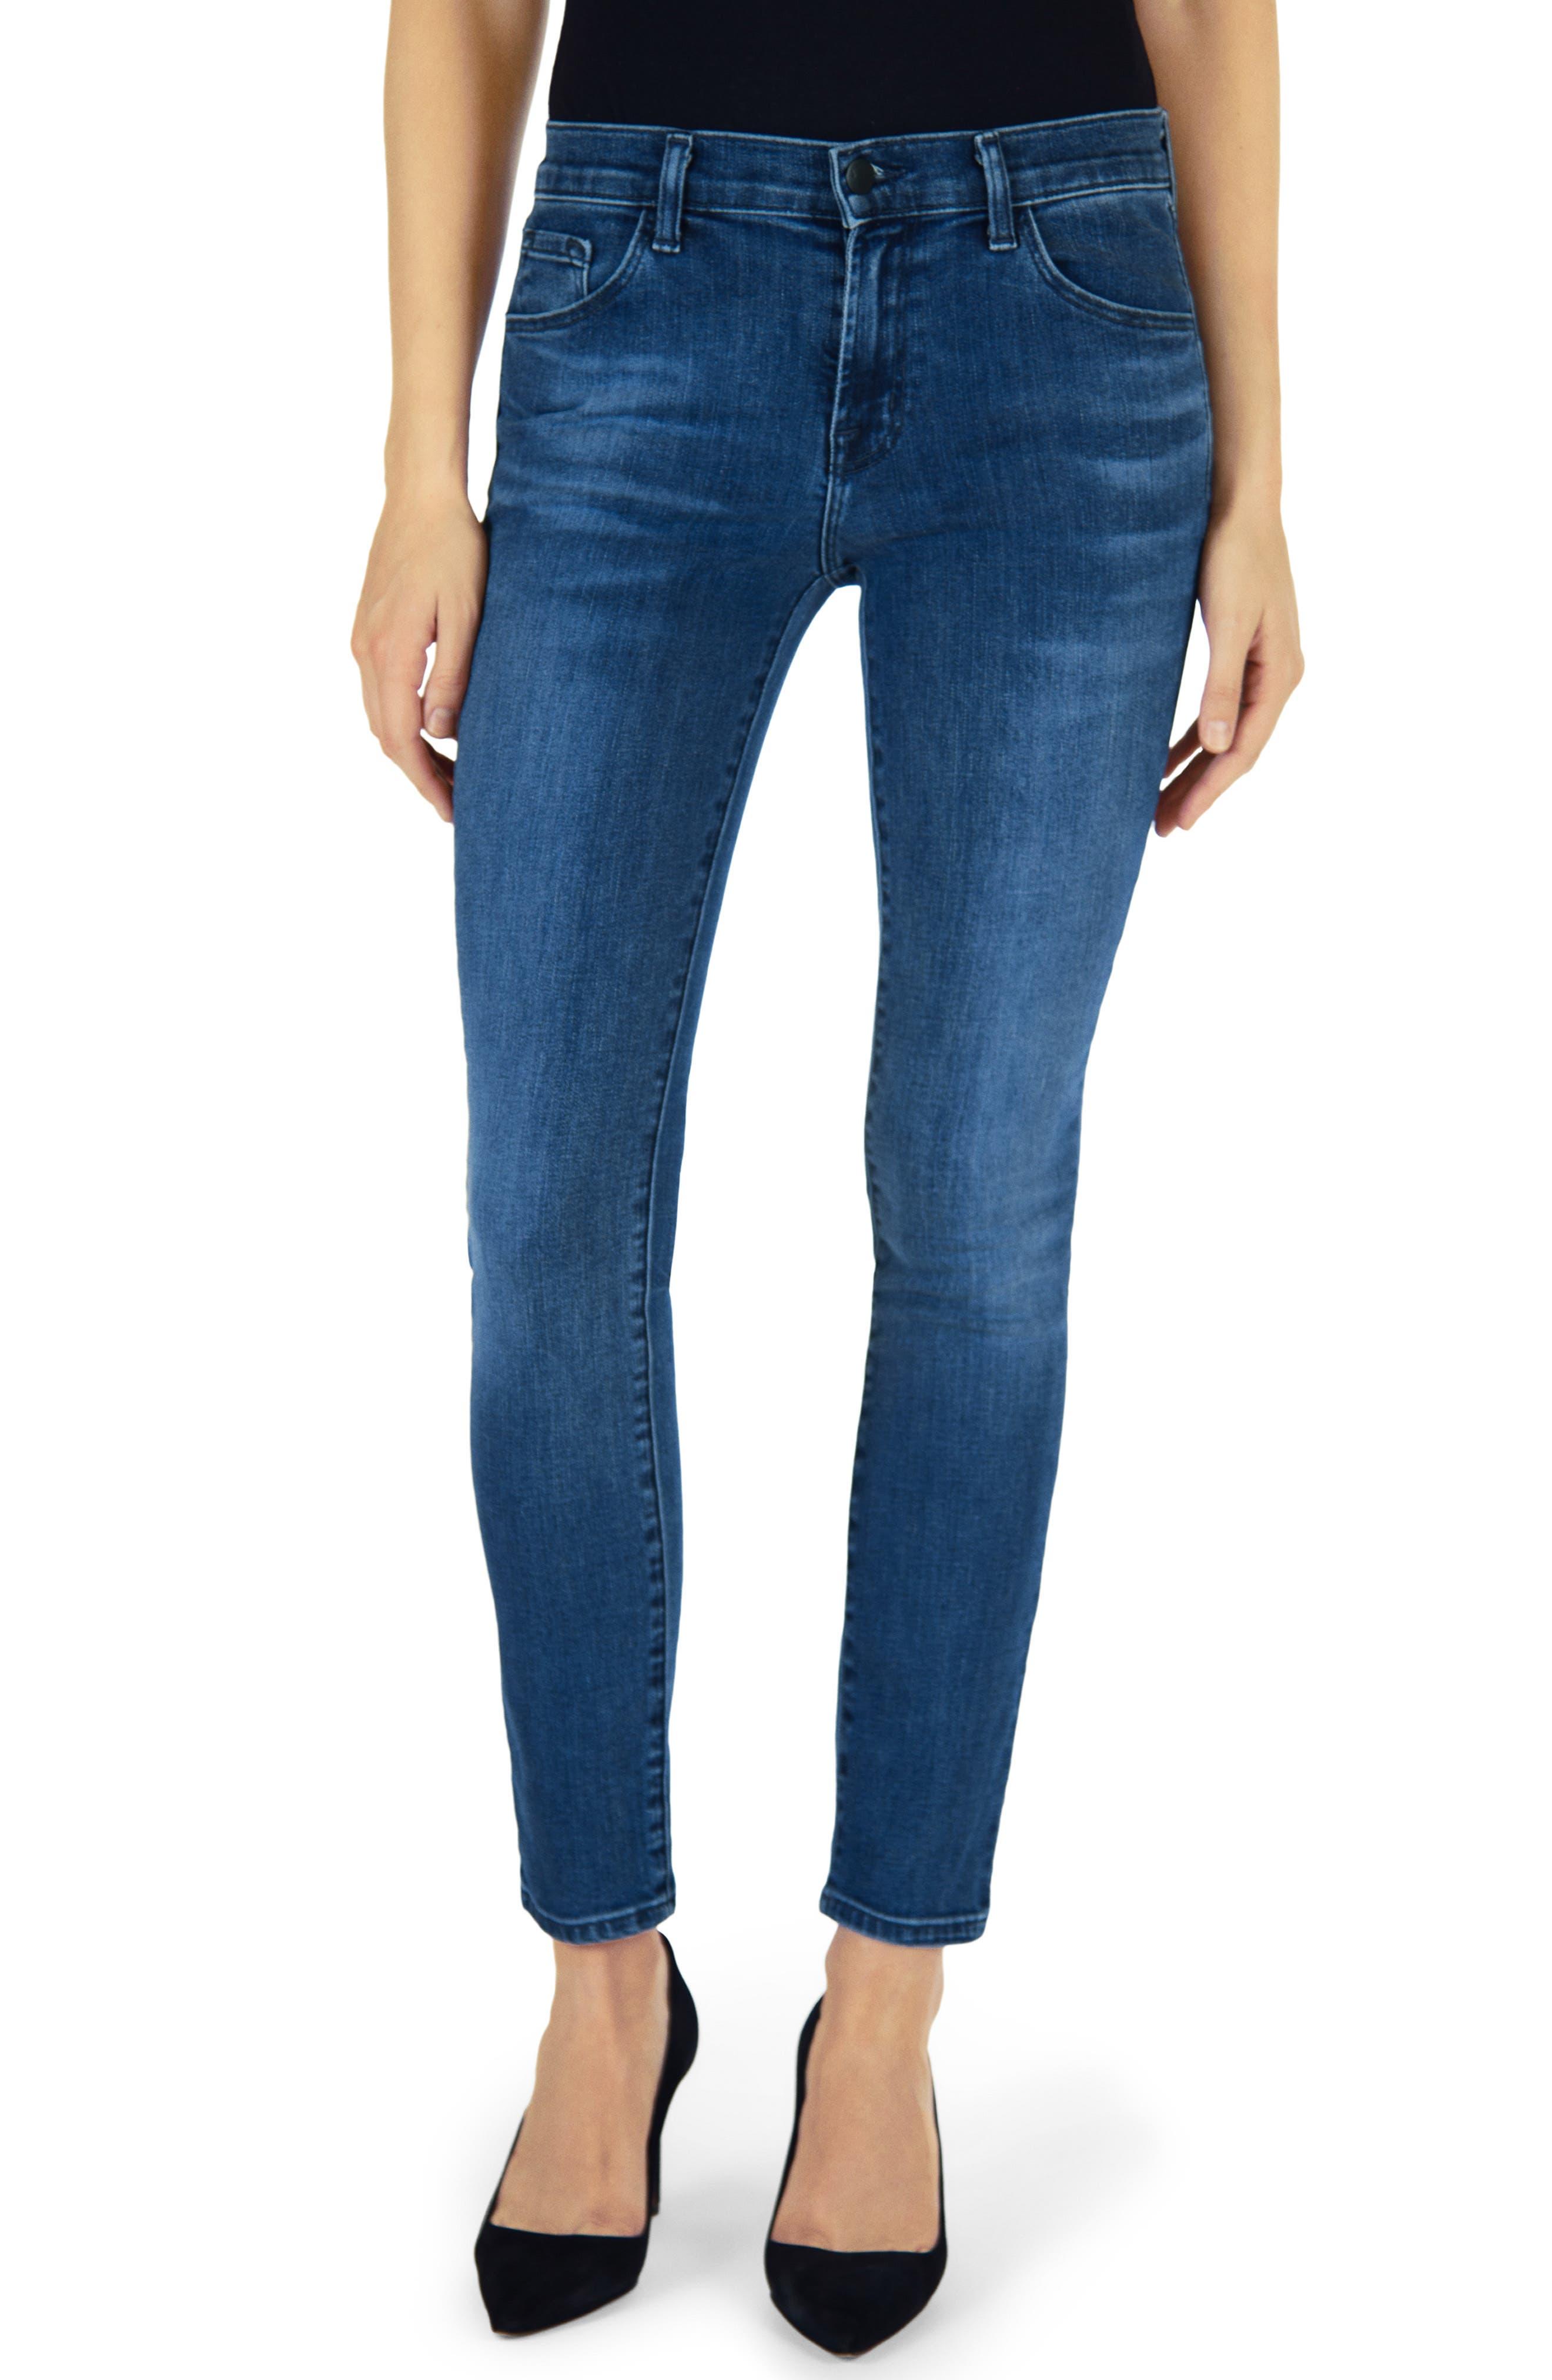 811 Skinny Jeans,                             Main thumbnail 1, color,                             400